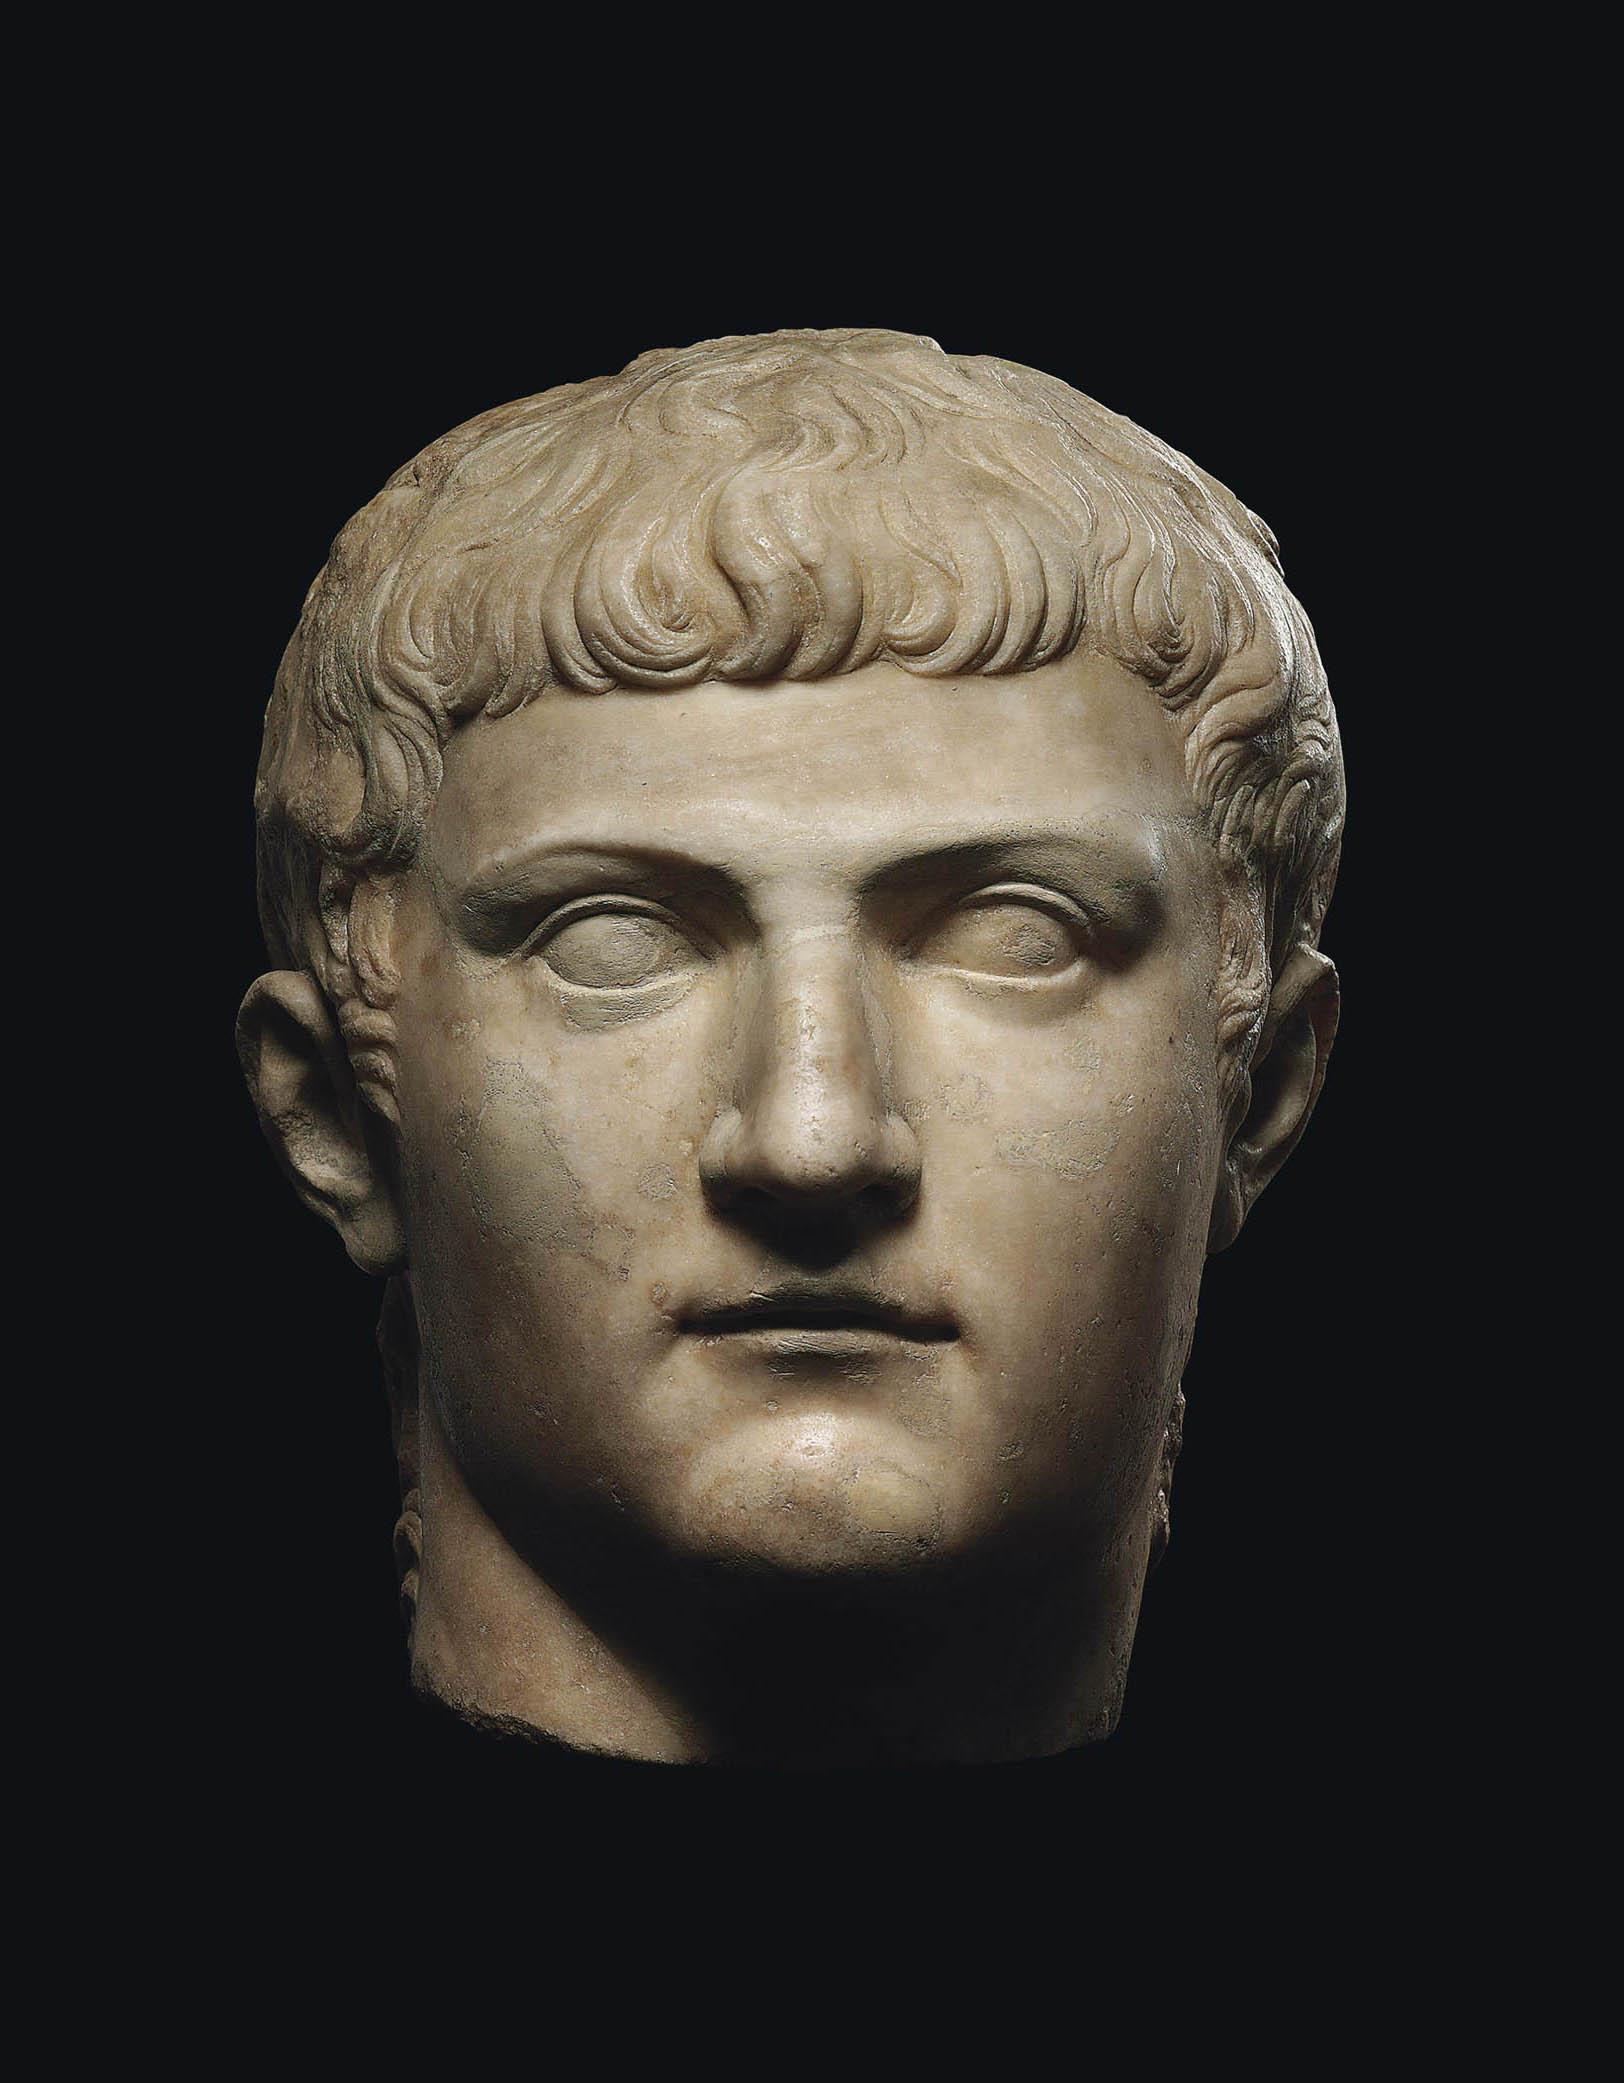 A ROMAN MARBLE PORTRAIT HEAD OF GERMANICUS